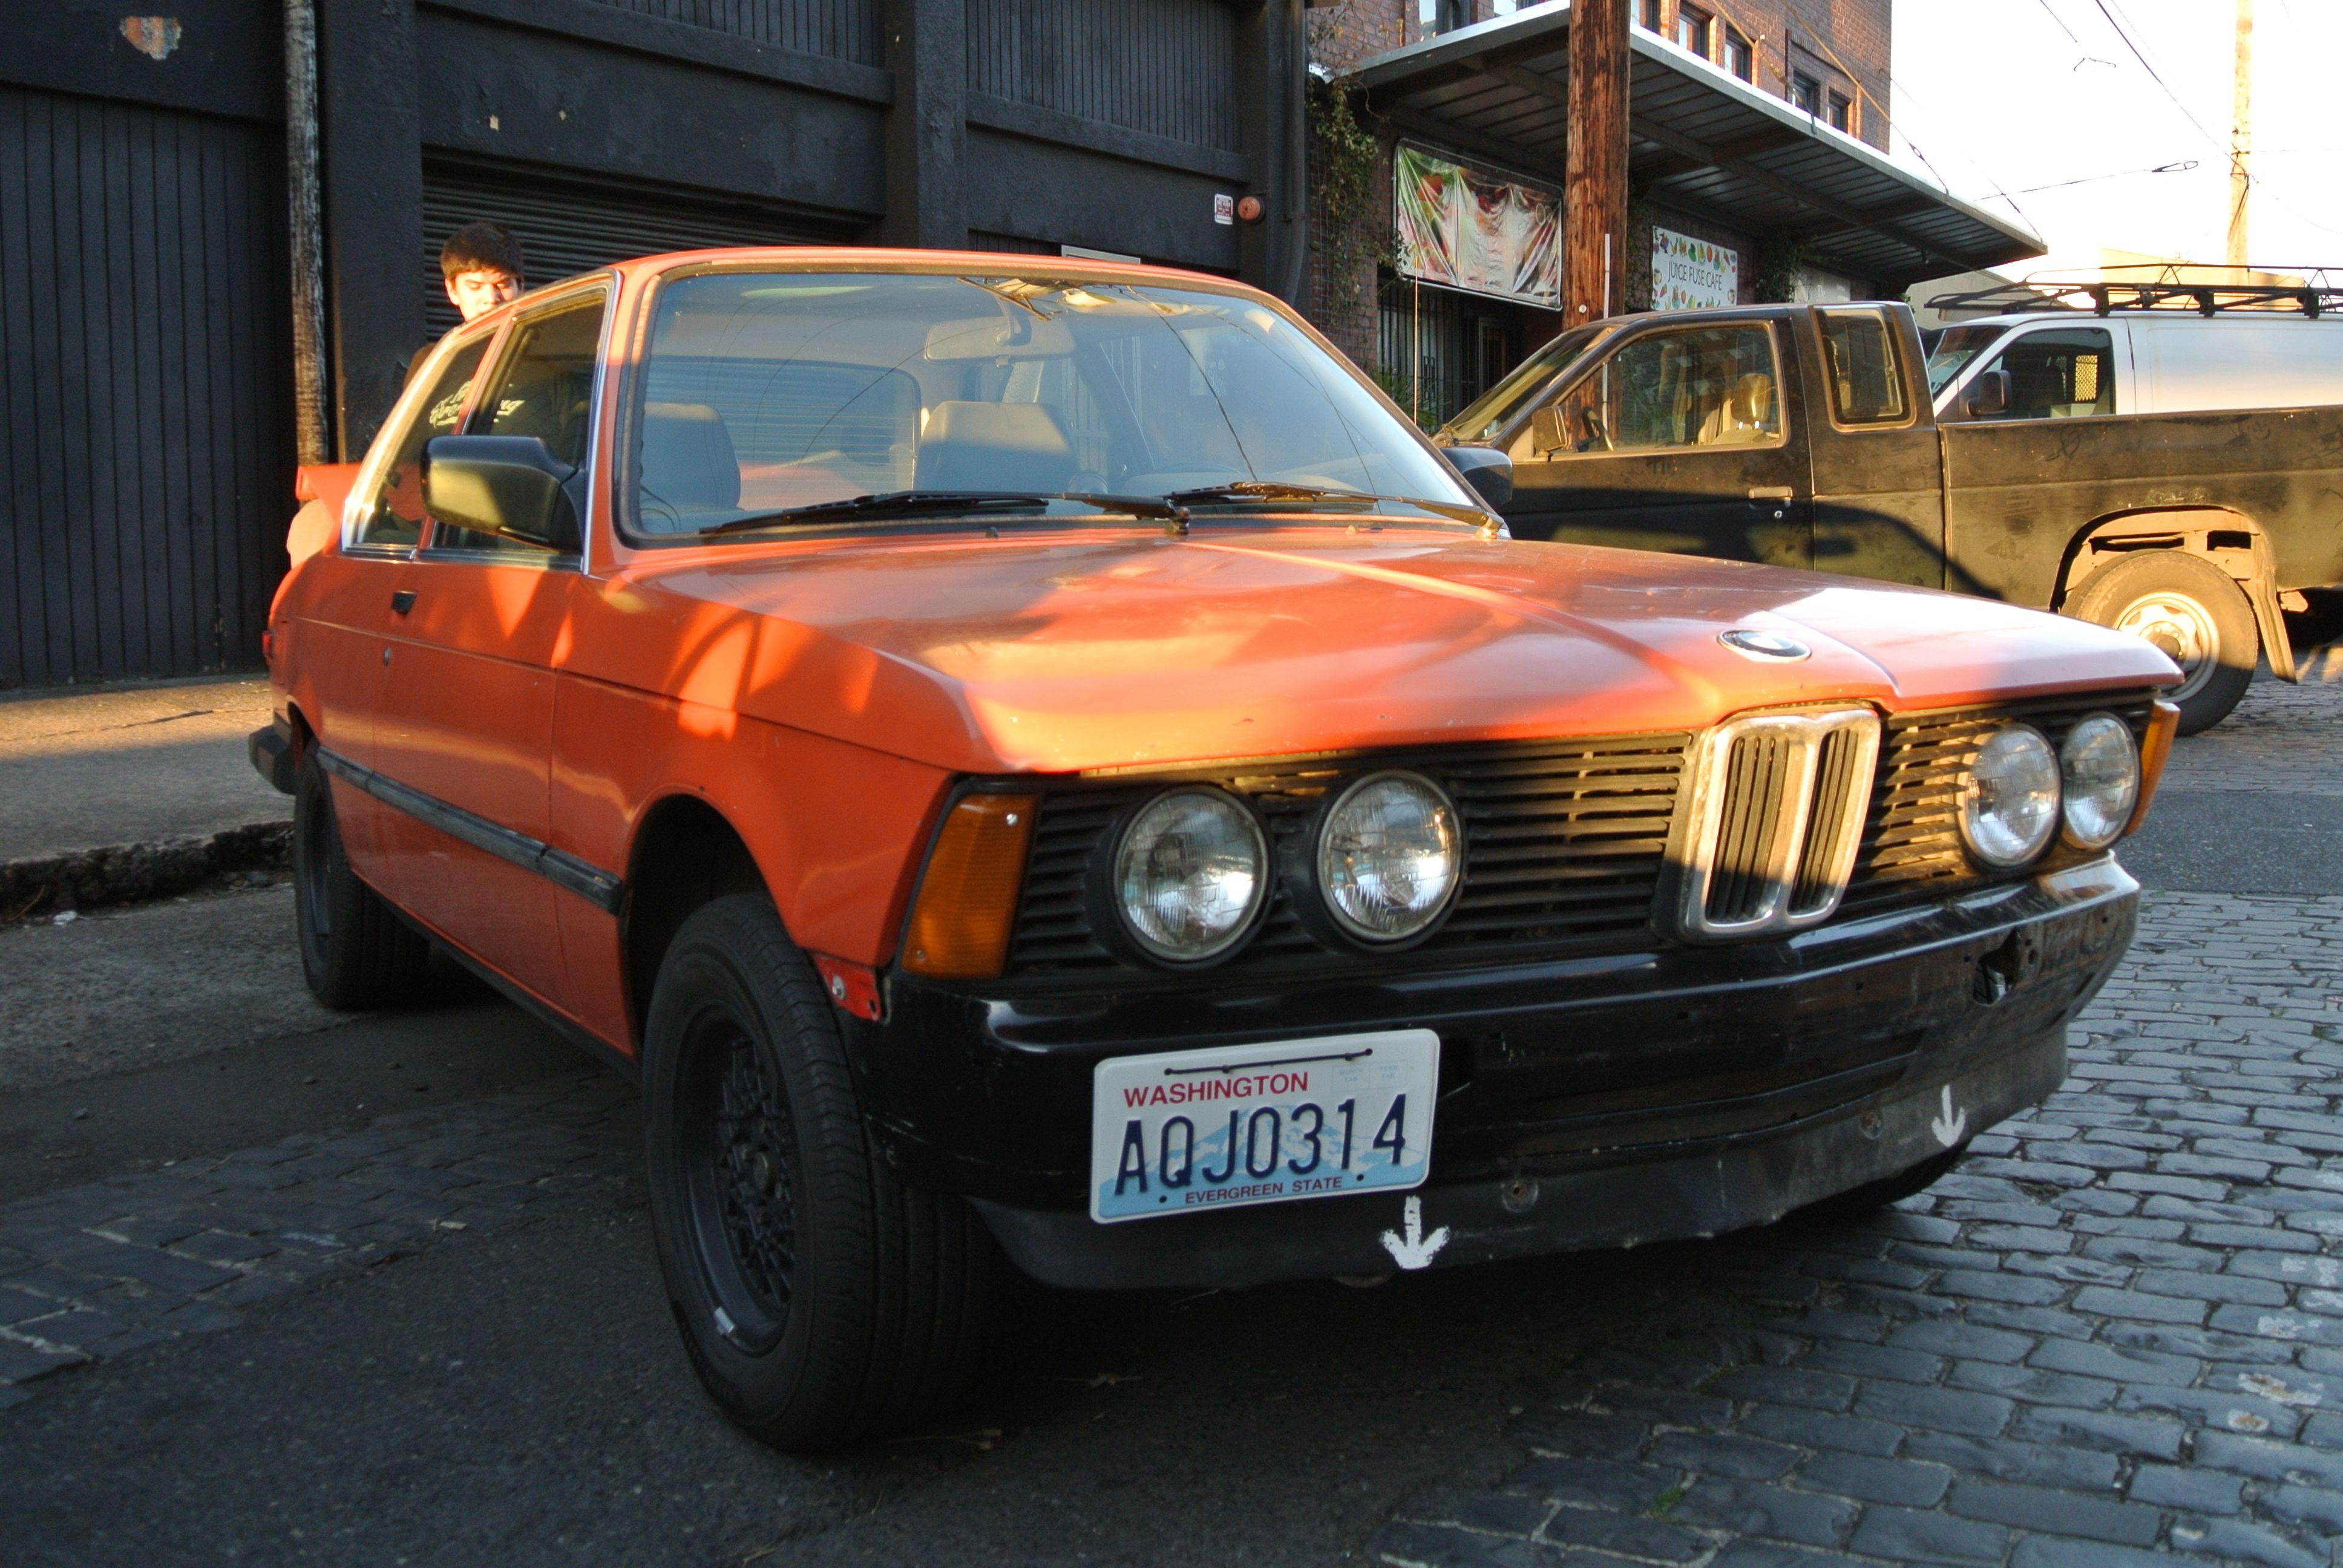 RDM WWW.TOPSHELFTEK.COM   Custom and Classic Cars   Pinterest   Cars